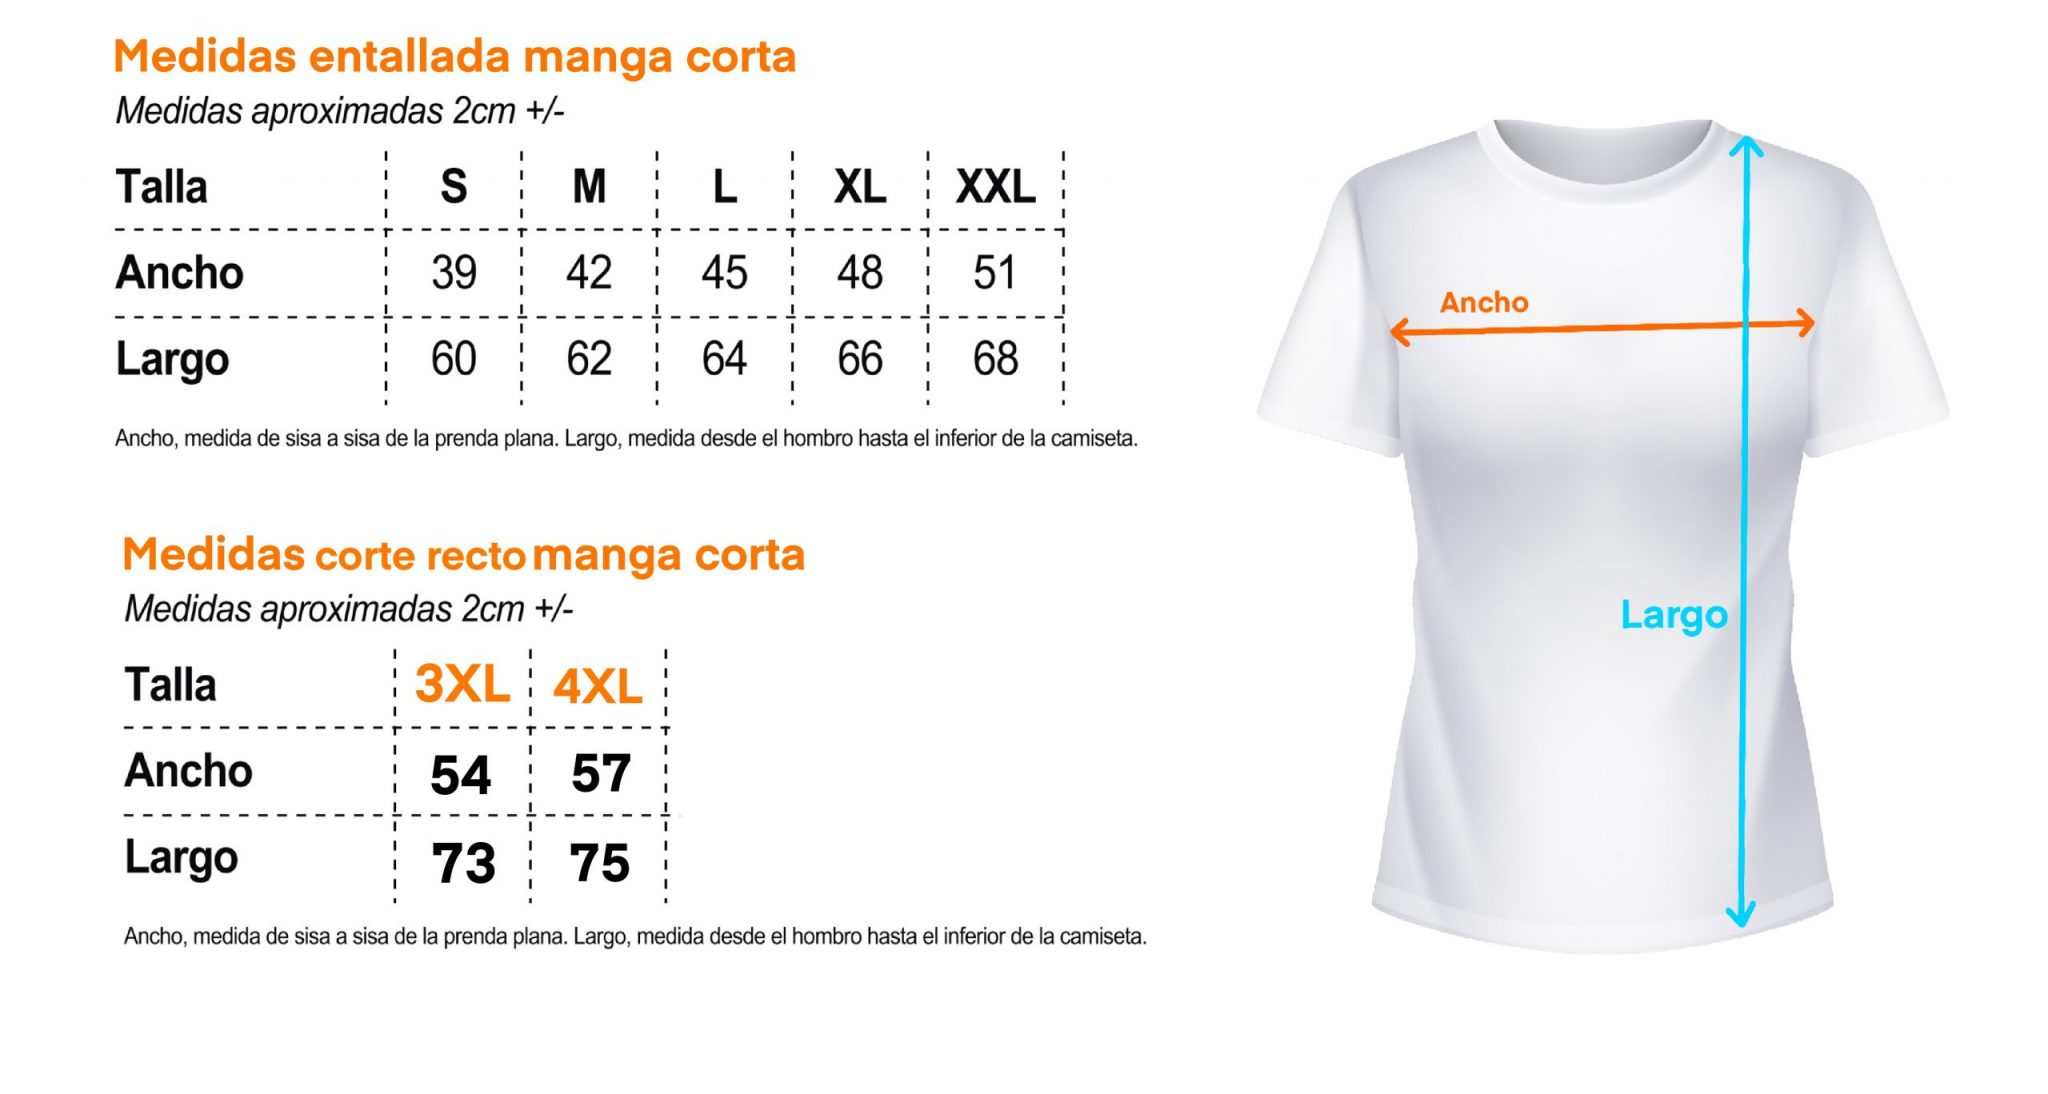 tabla de medidas camiseta chica manga corta entallada